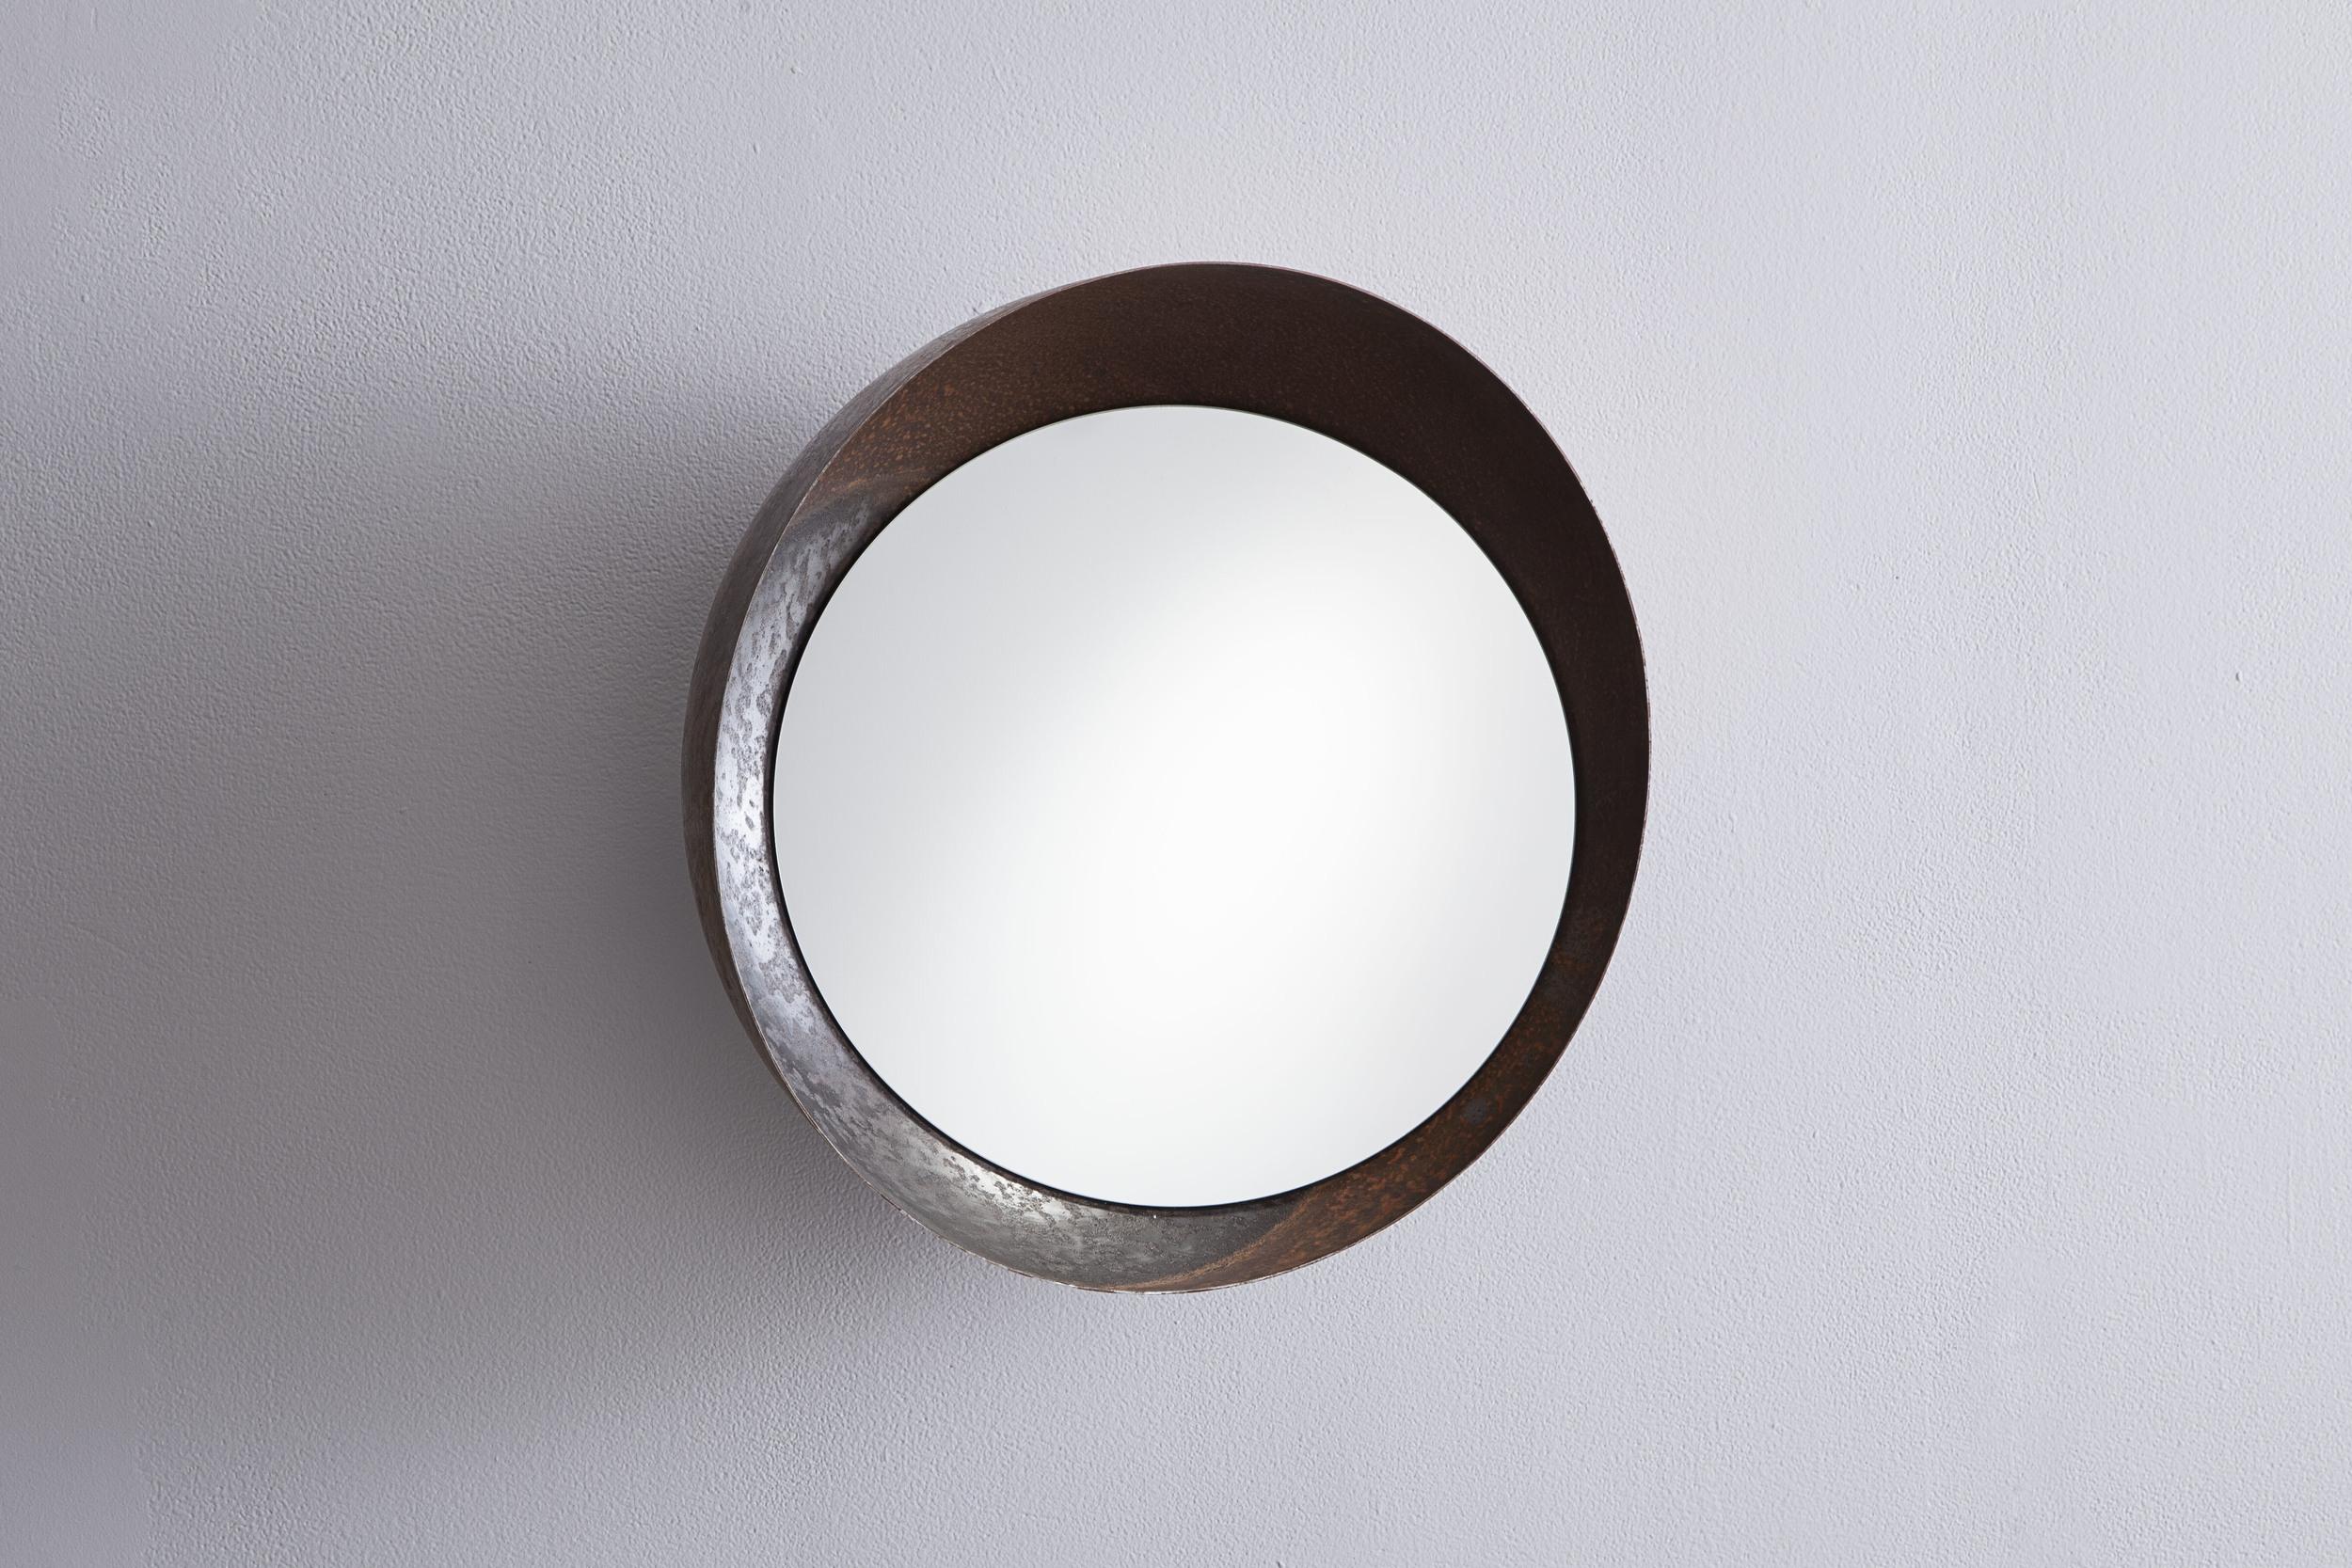 Eccentric Mirror 1.jpg